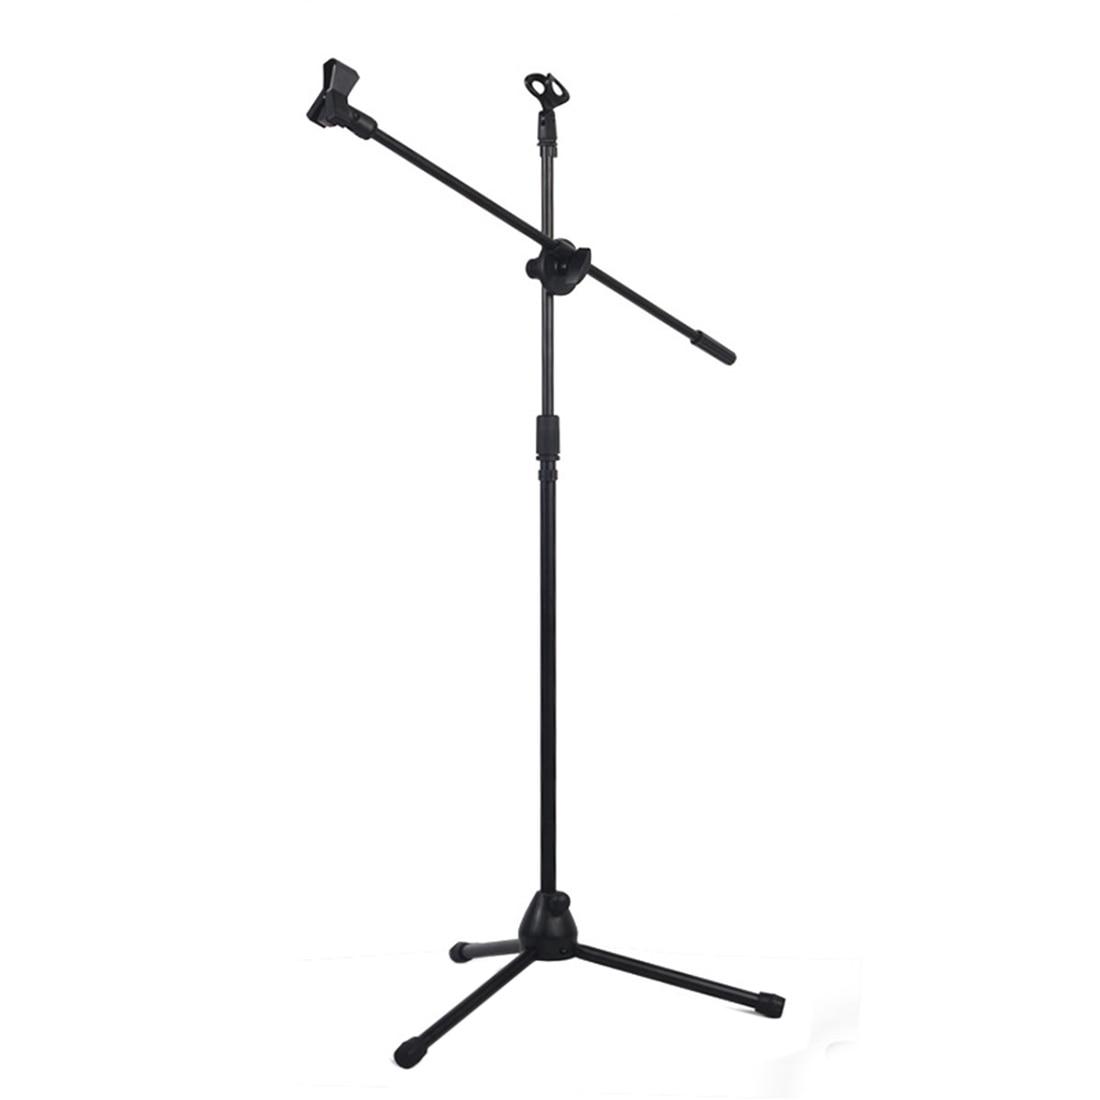 Support professionnel de Microphone de support de plancher de Boom doscillationSupport professionnel de Microphone de support de plancher de Boom doscillation